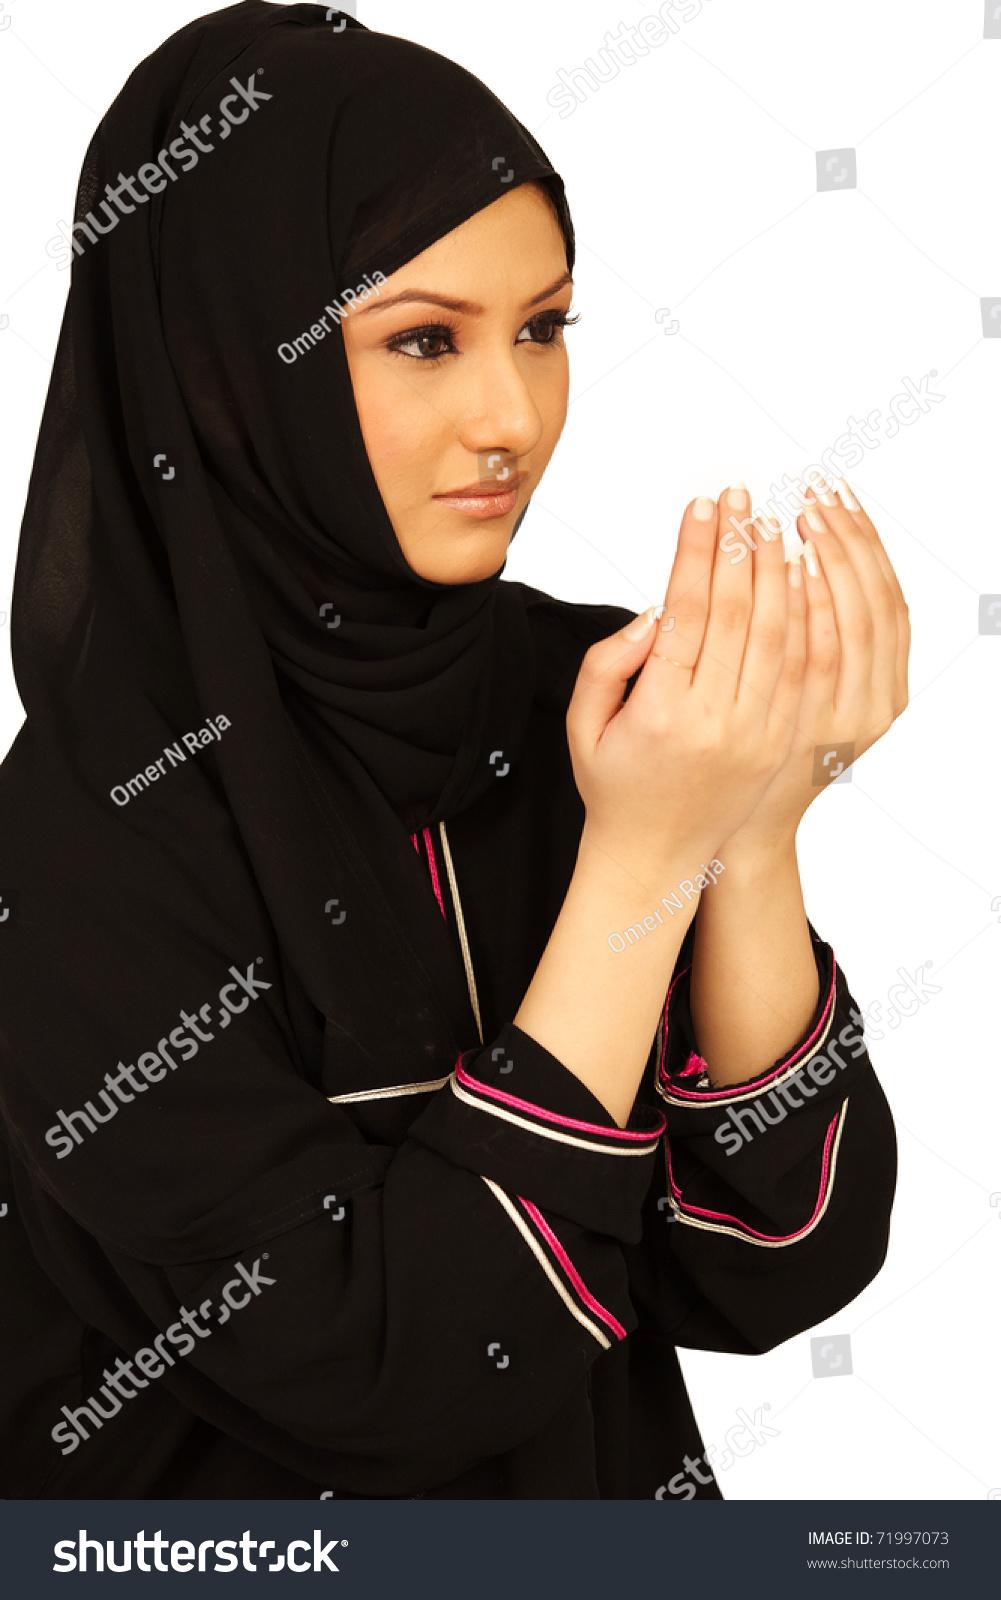 Islamic Girl Praying Wallpapers Young Muslim Girl Praying Stock Photo 71997073 Shutterstock